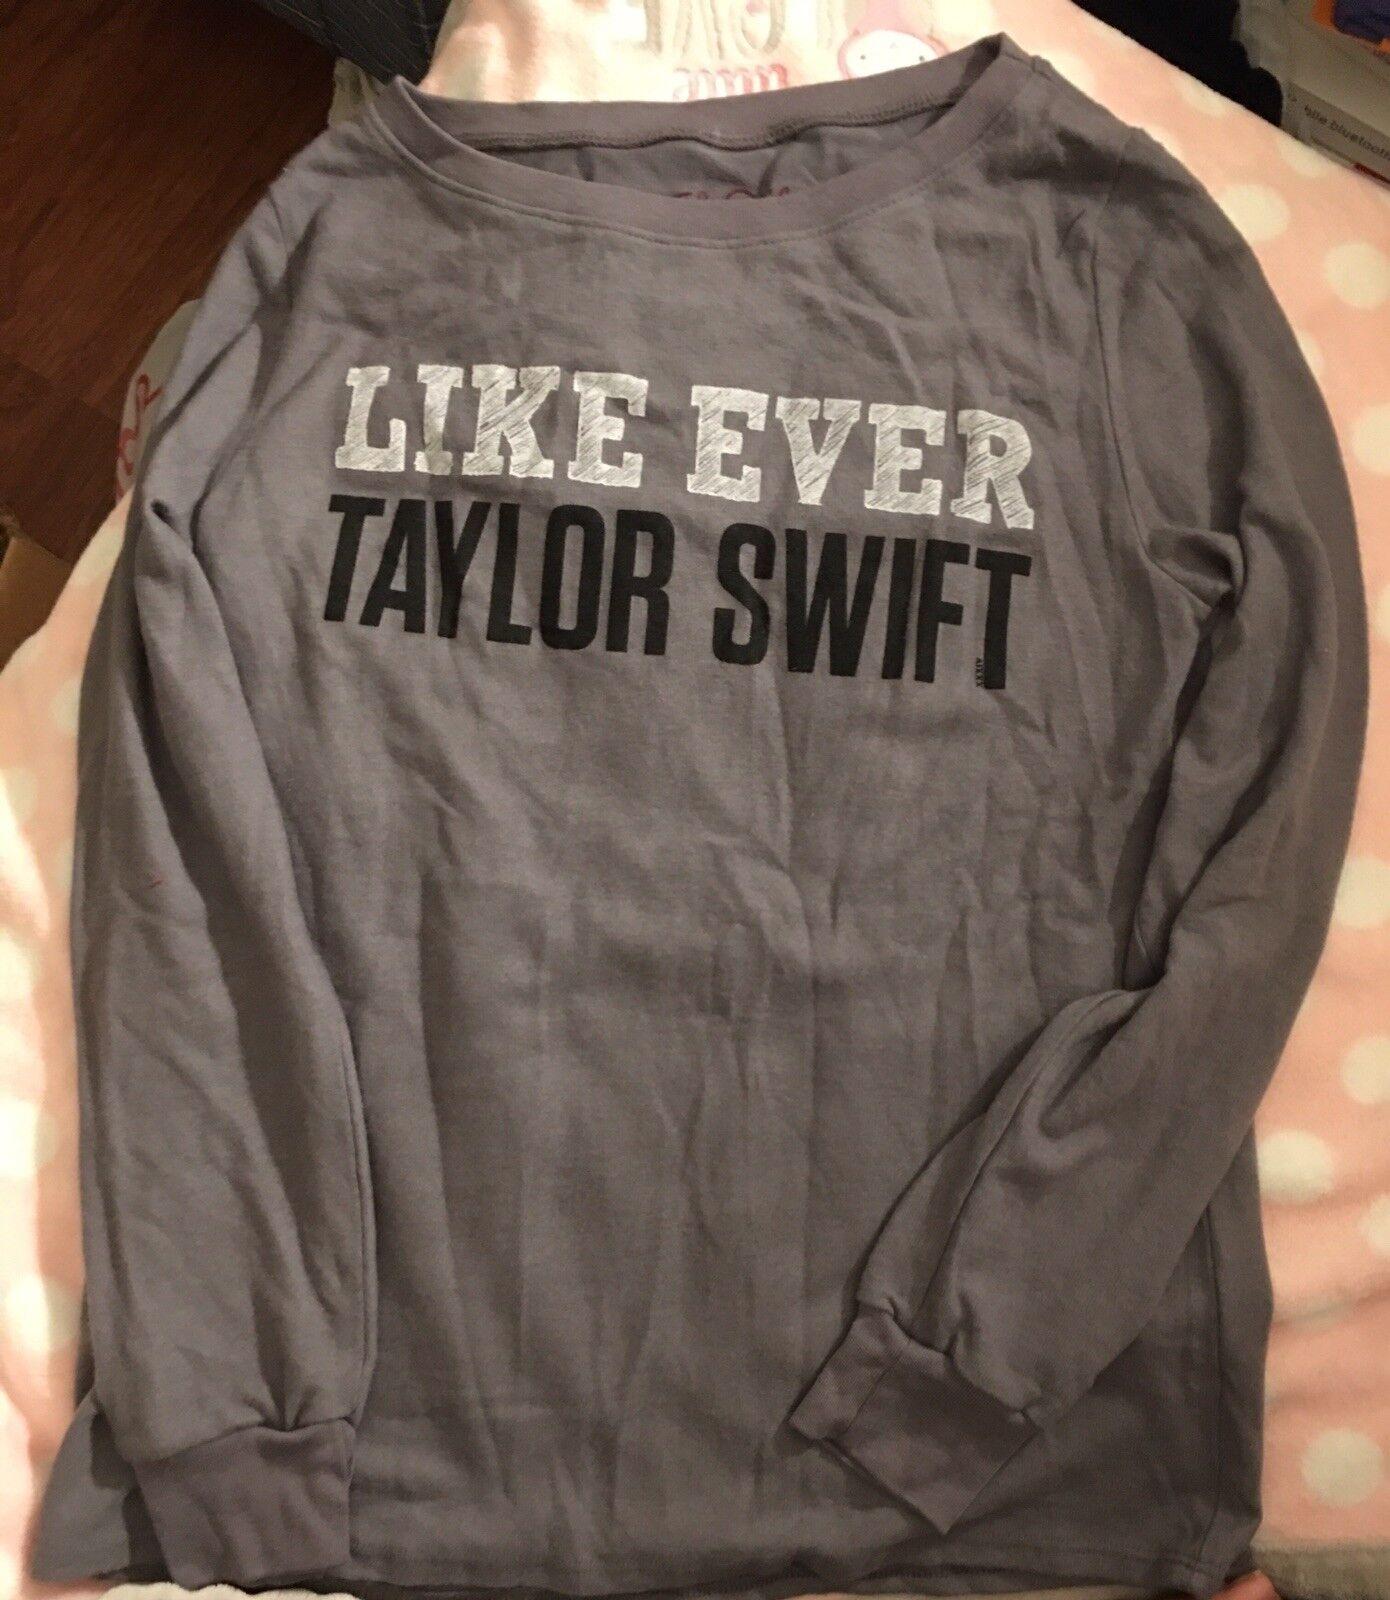 2 pkg Taylor Swift Like Ever Long Sleeve top Shirt Sweater Größe Small